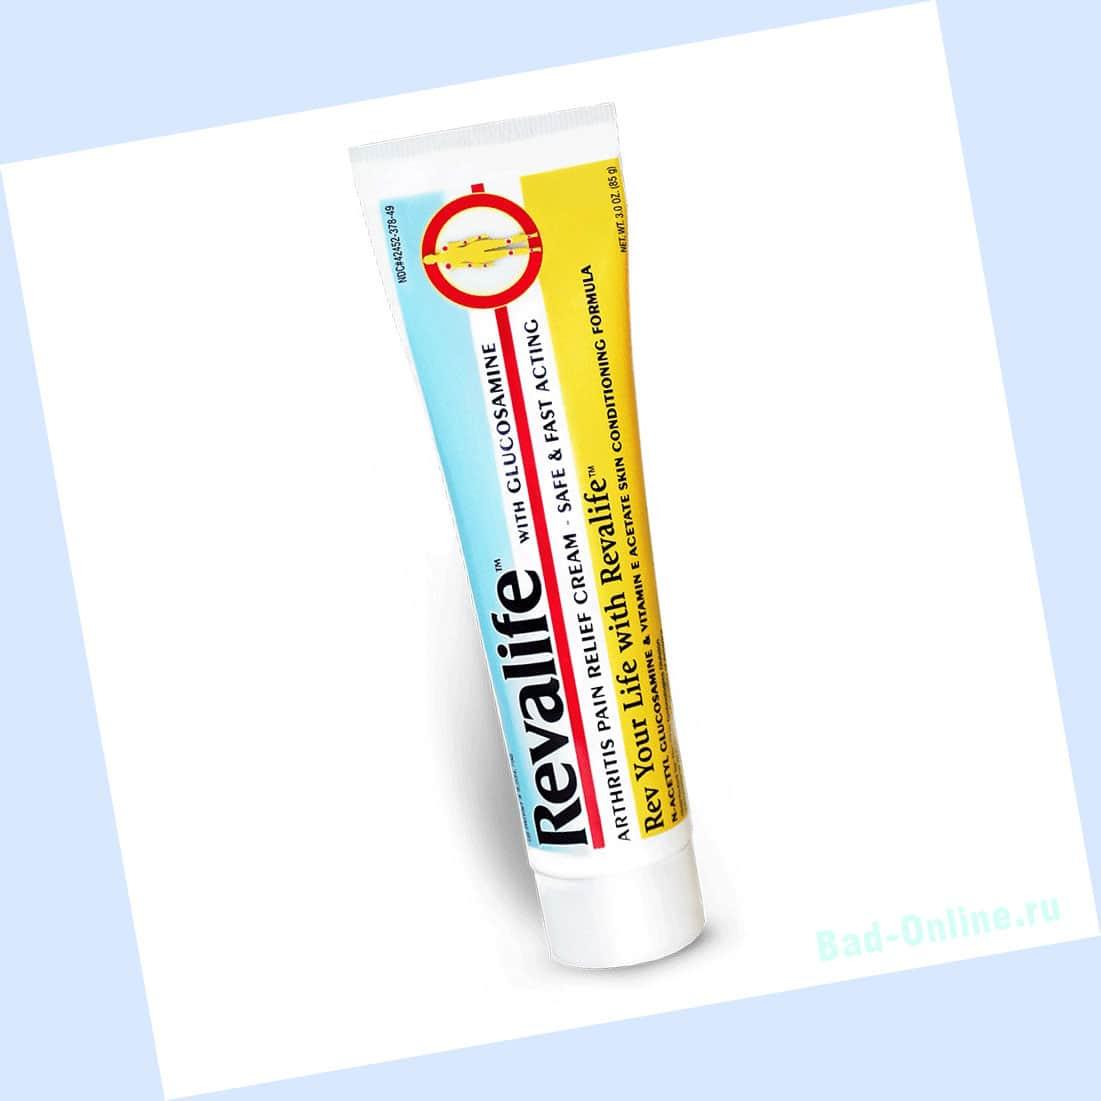 Оригинал препарата Revalife, купленный на сайте Bad-Online.ru